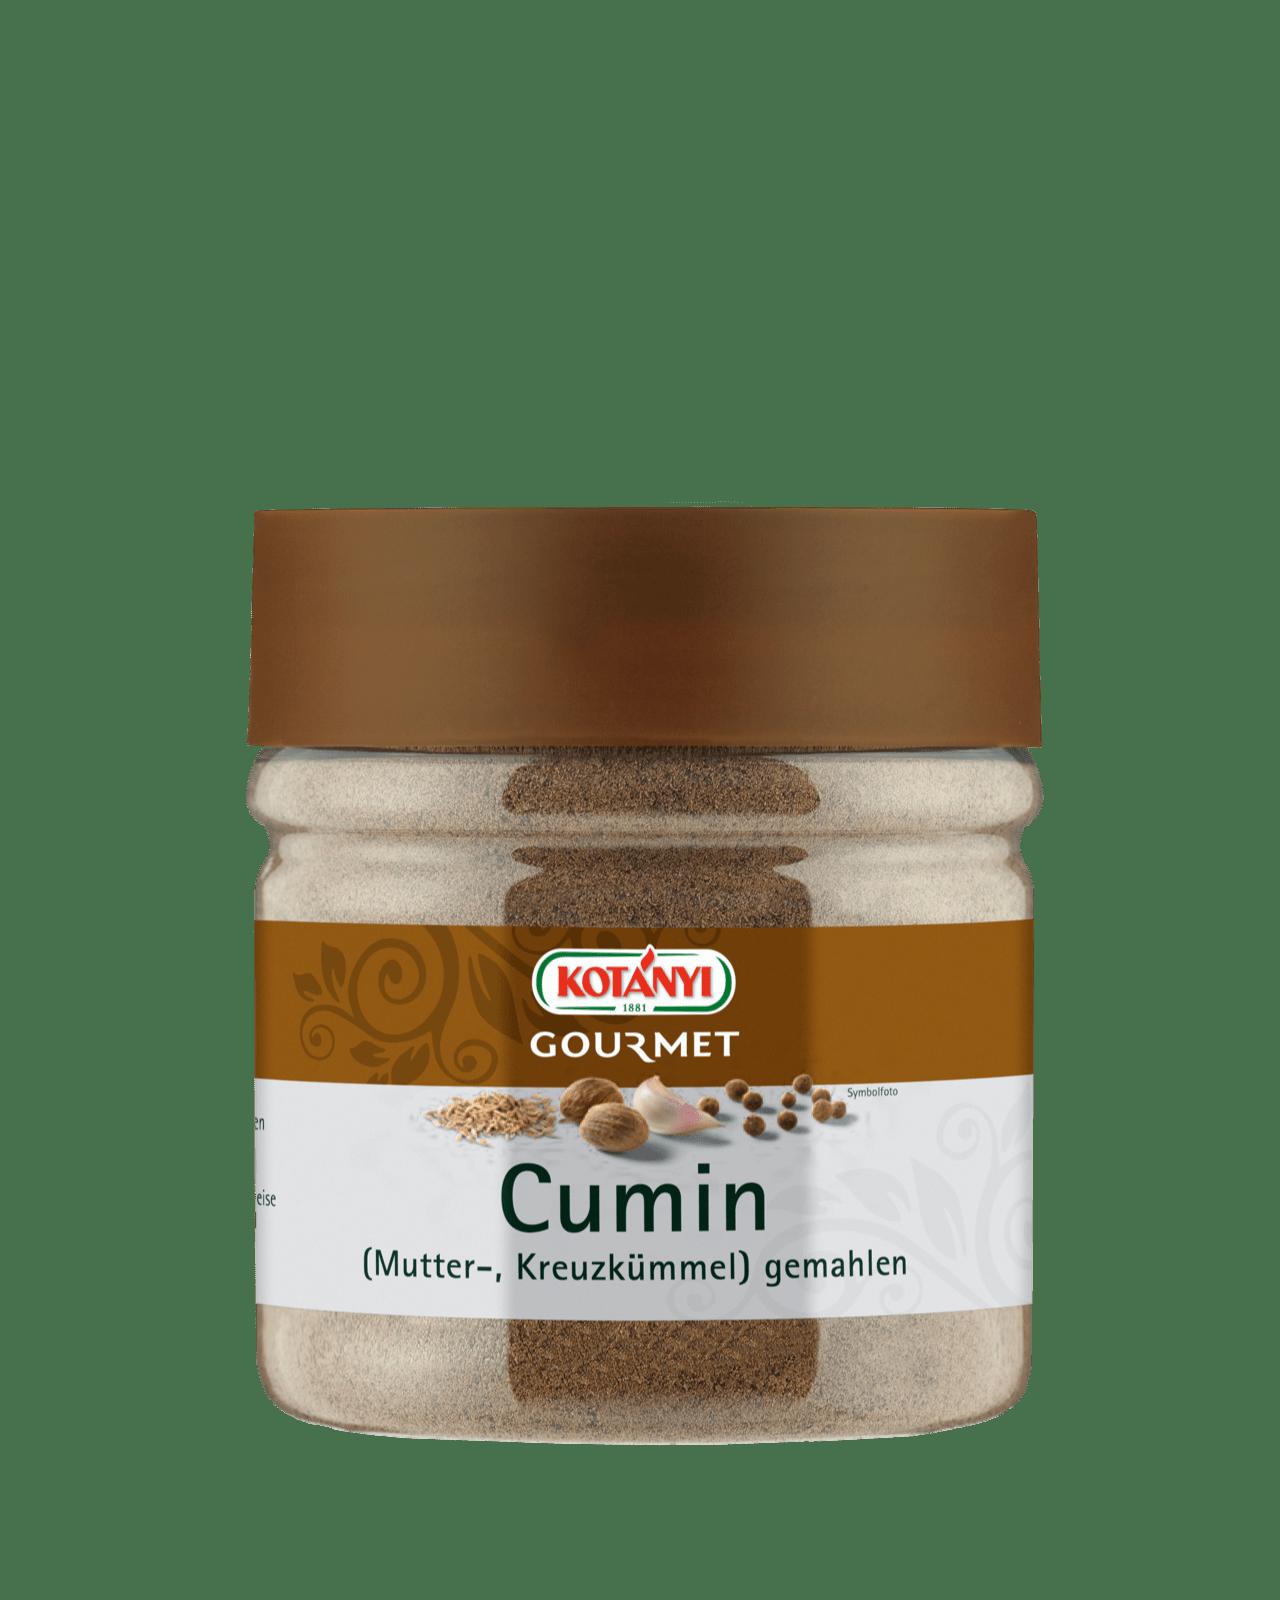 Kotányi Gourmet Cumin Kreuzkümmel gemahlen in der 400ccm Dose